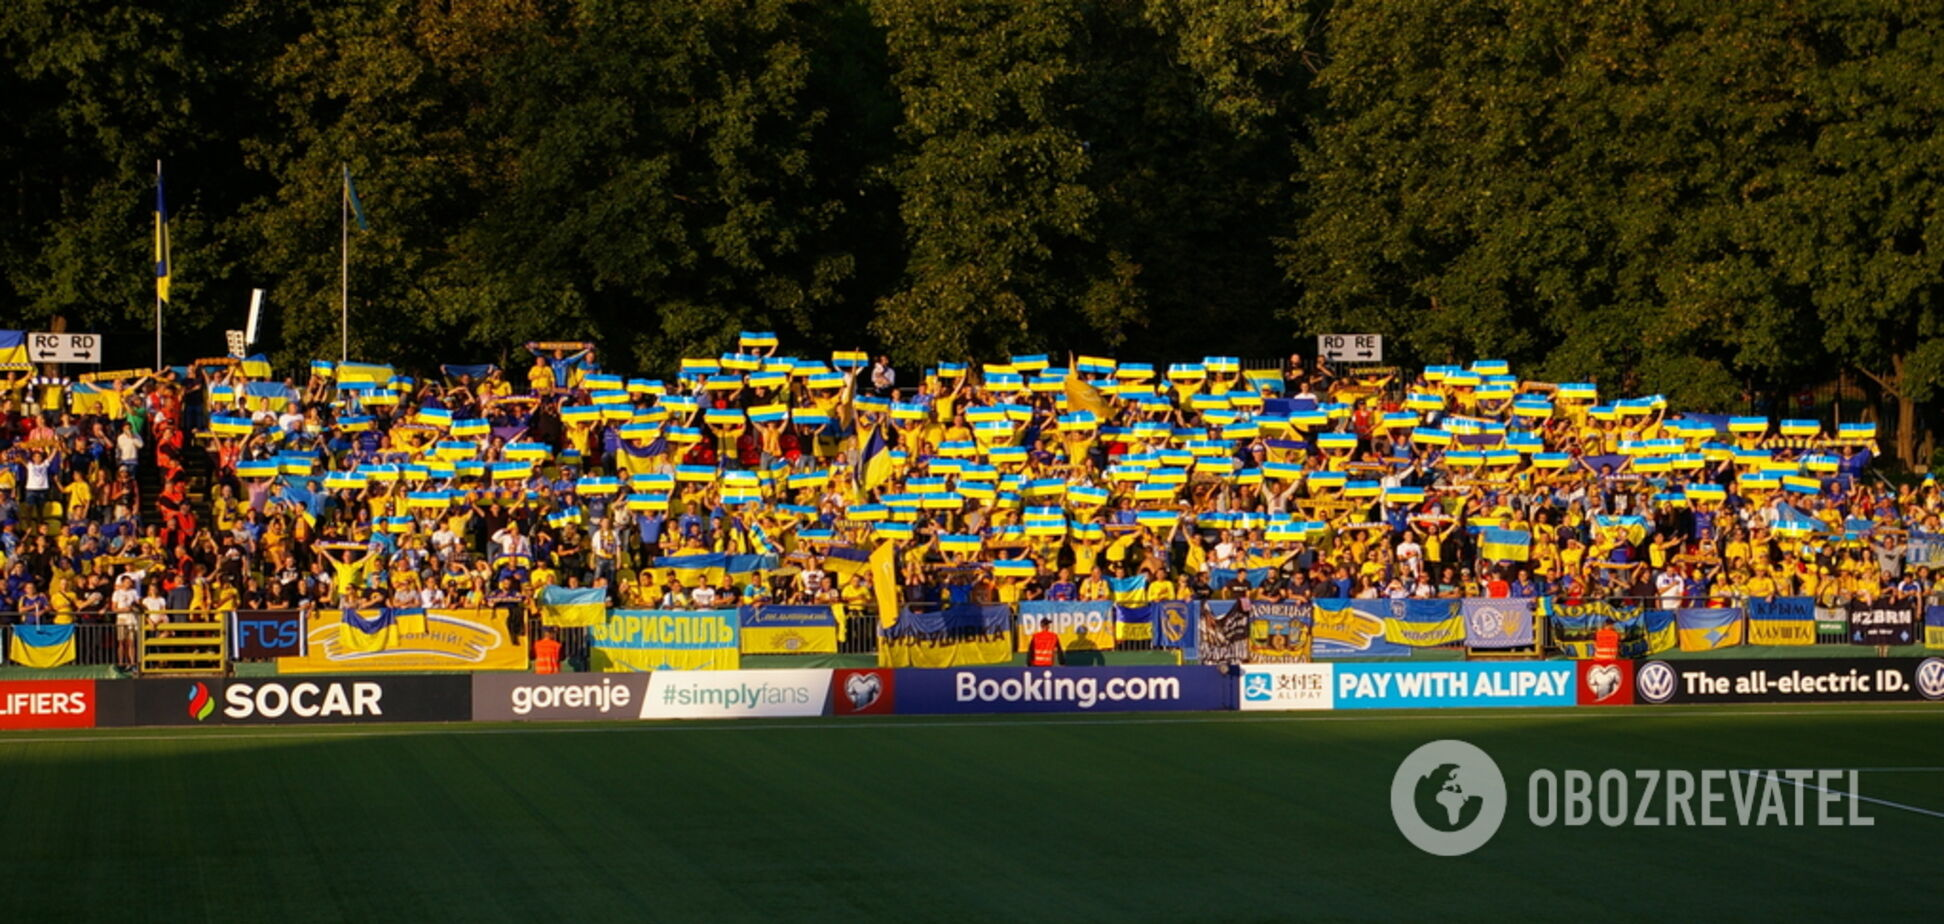 Роналду довелося почекати: репортаж з переможного матчу Україна в Литві